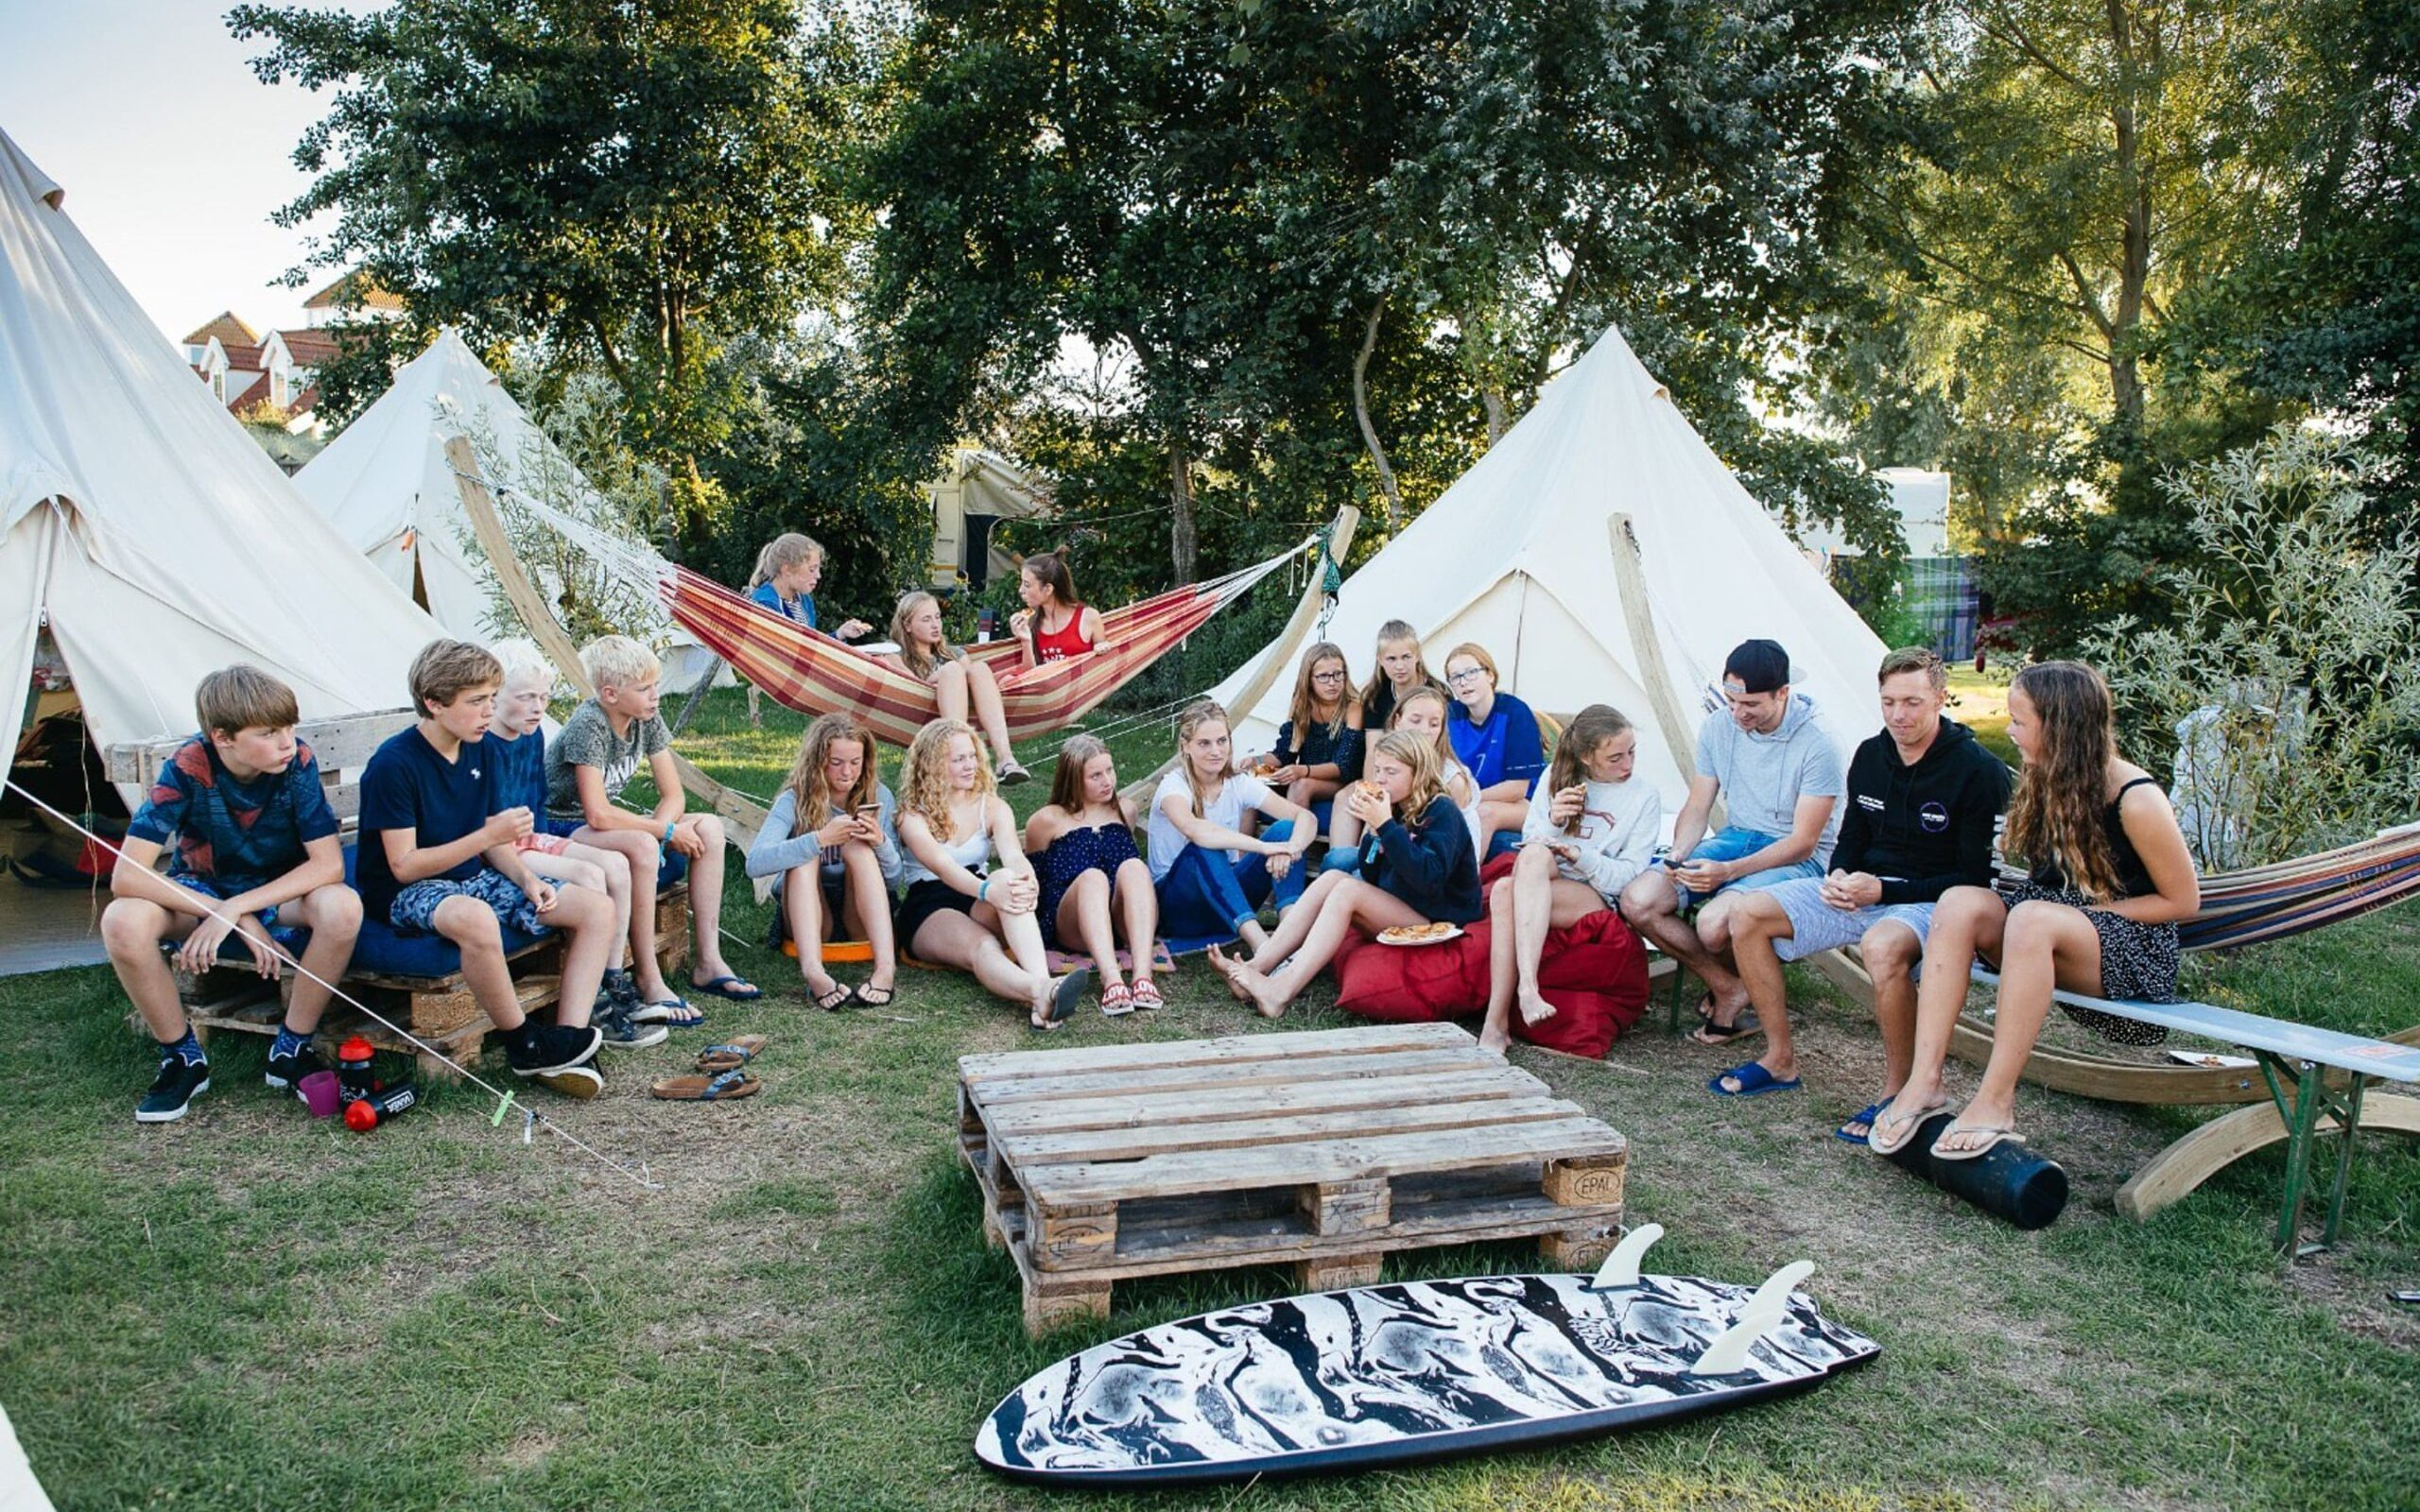 Kamp surfen nederland surfboard